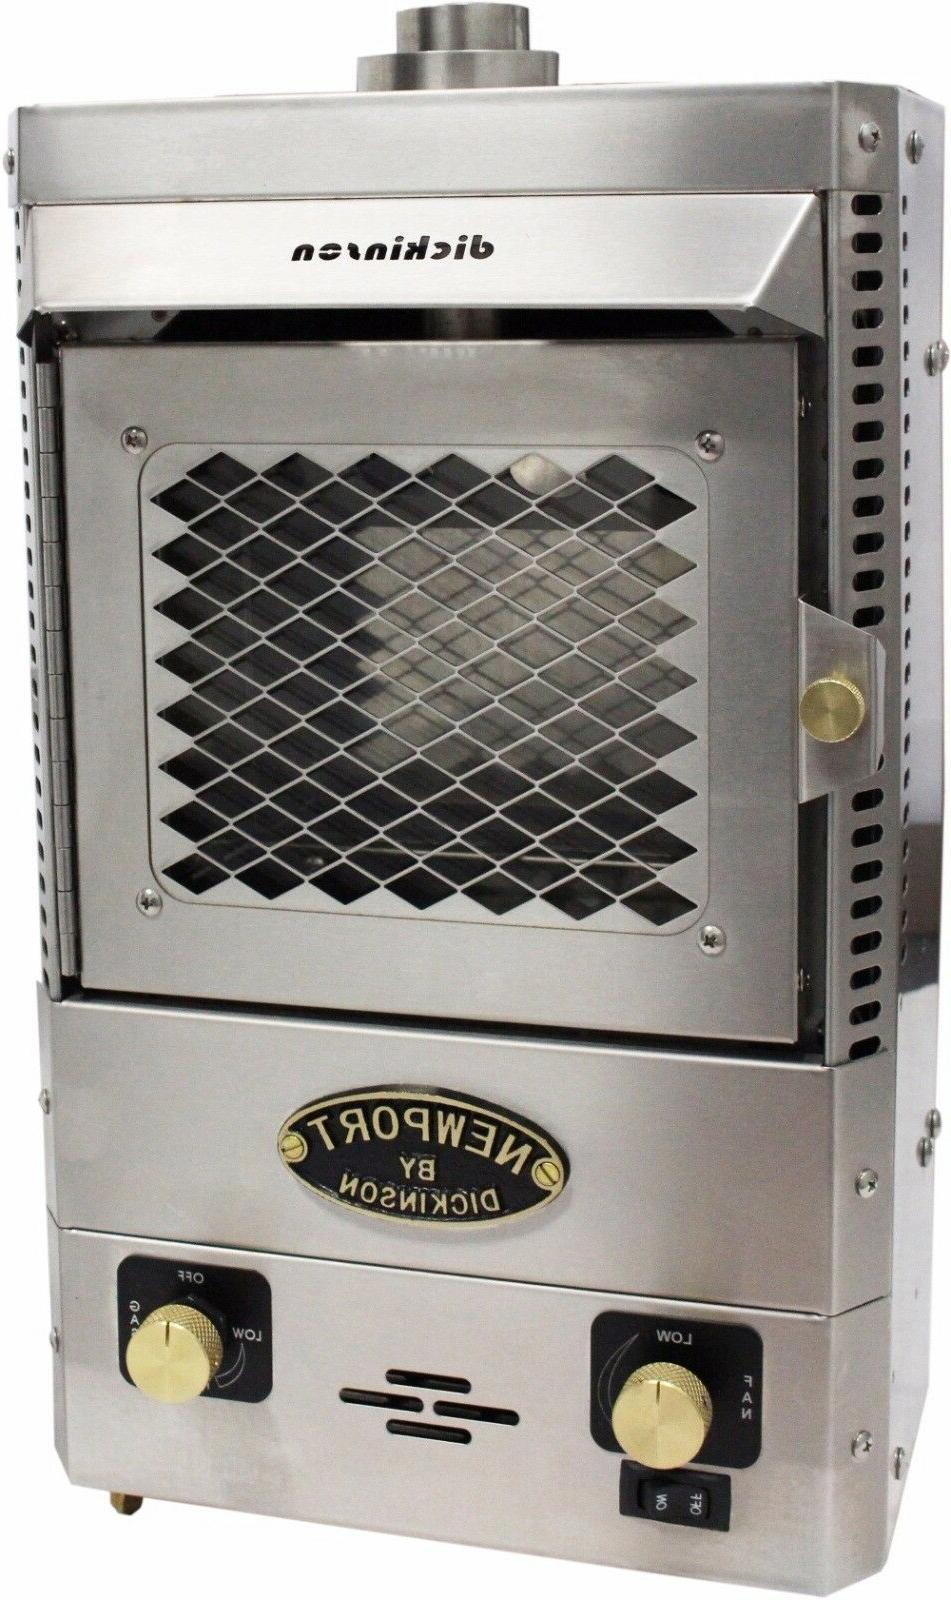 Dickinson Newport Vent Heaters 00-NEW-P12000